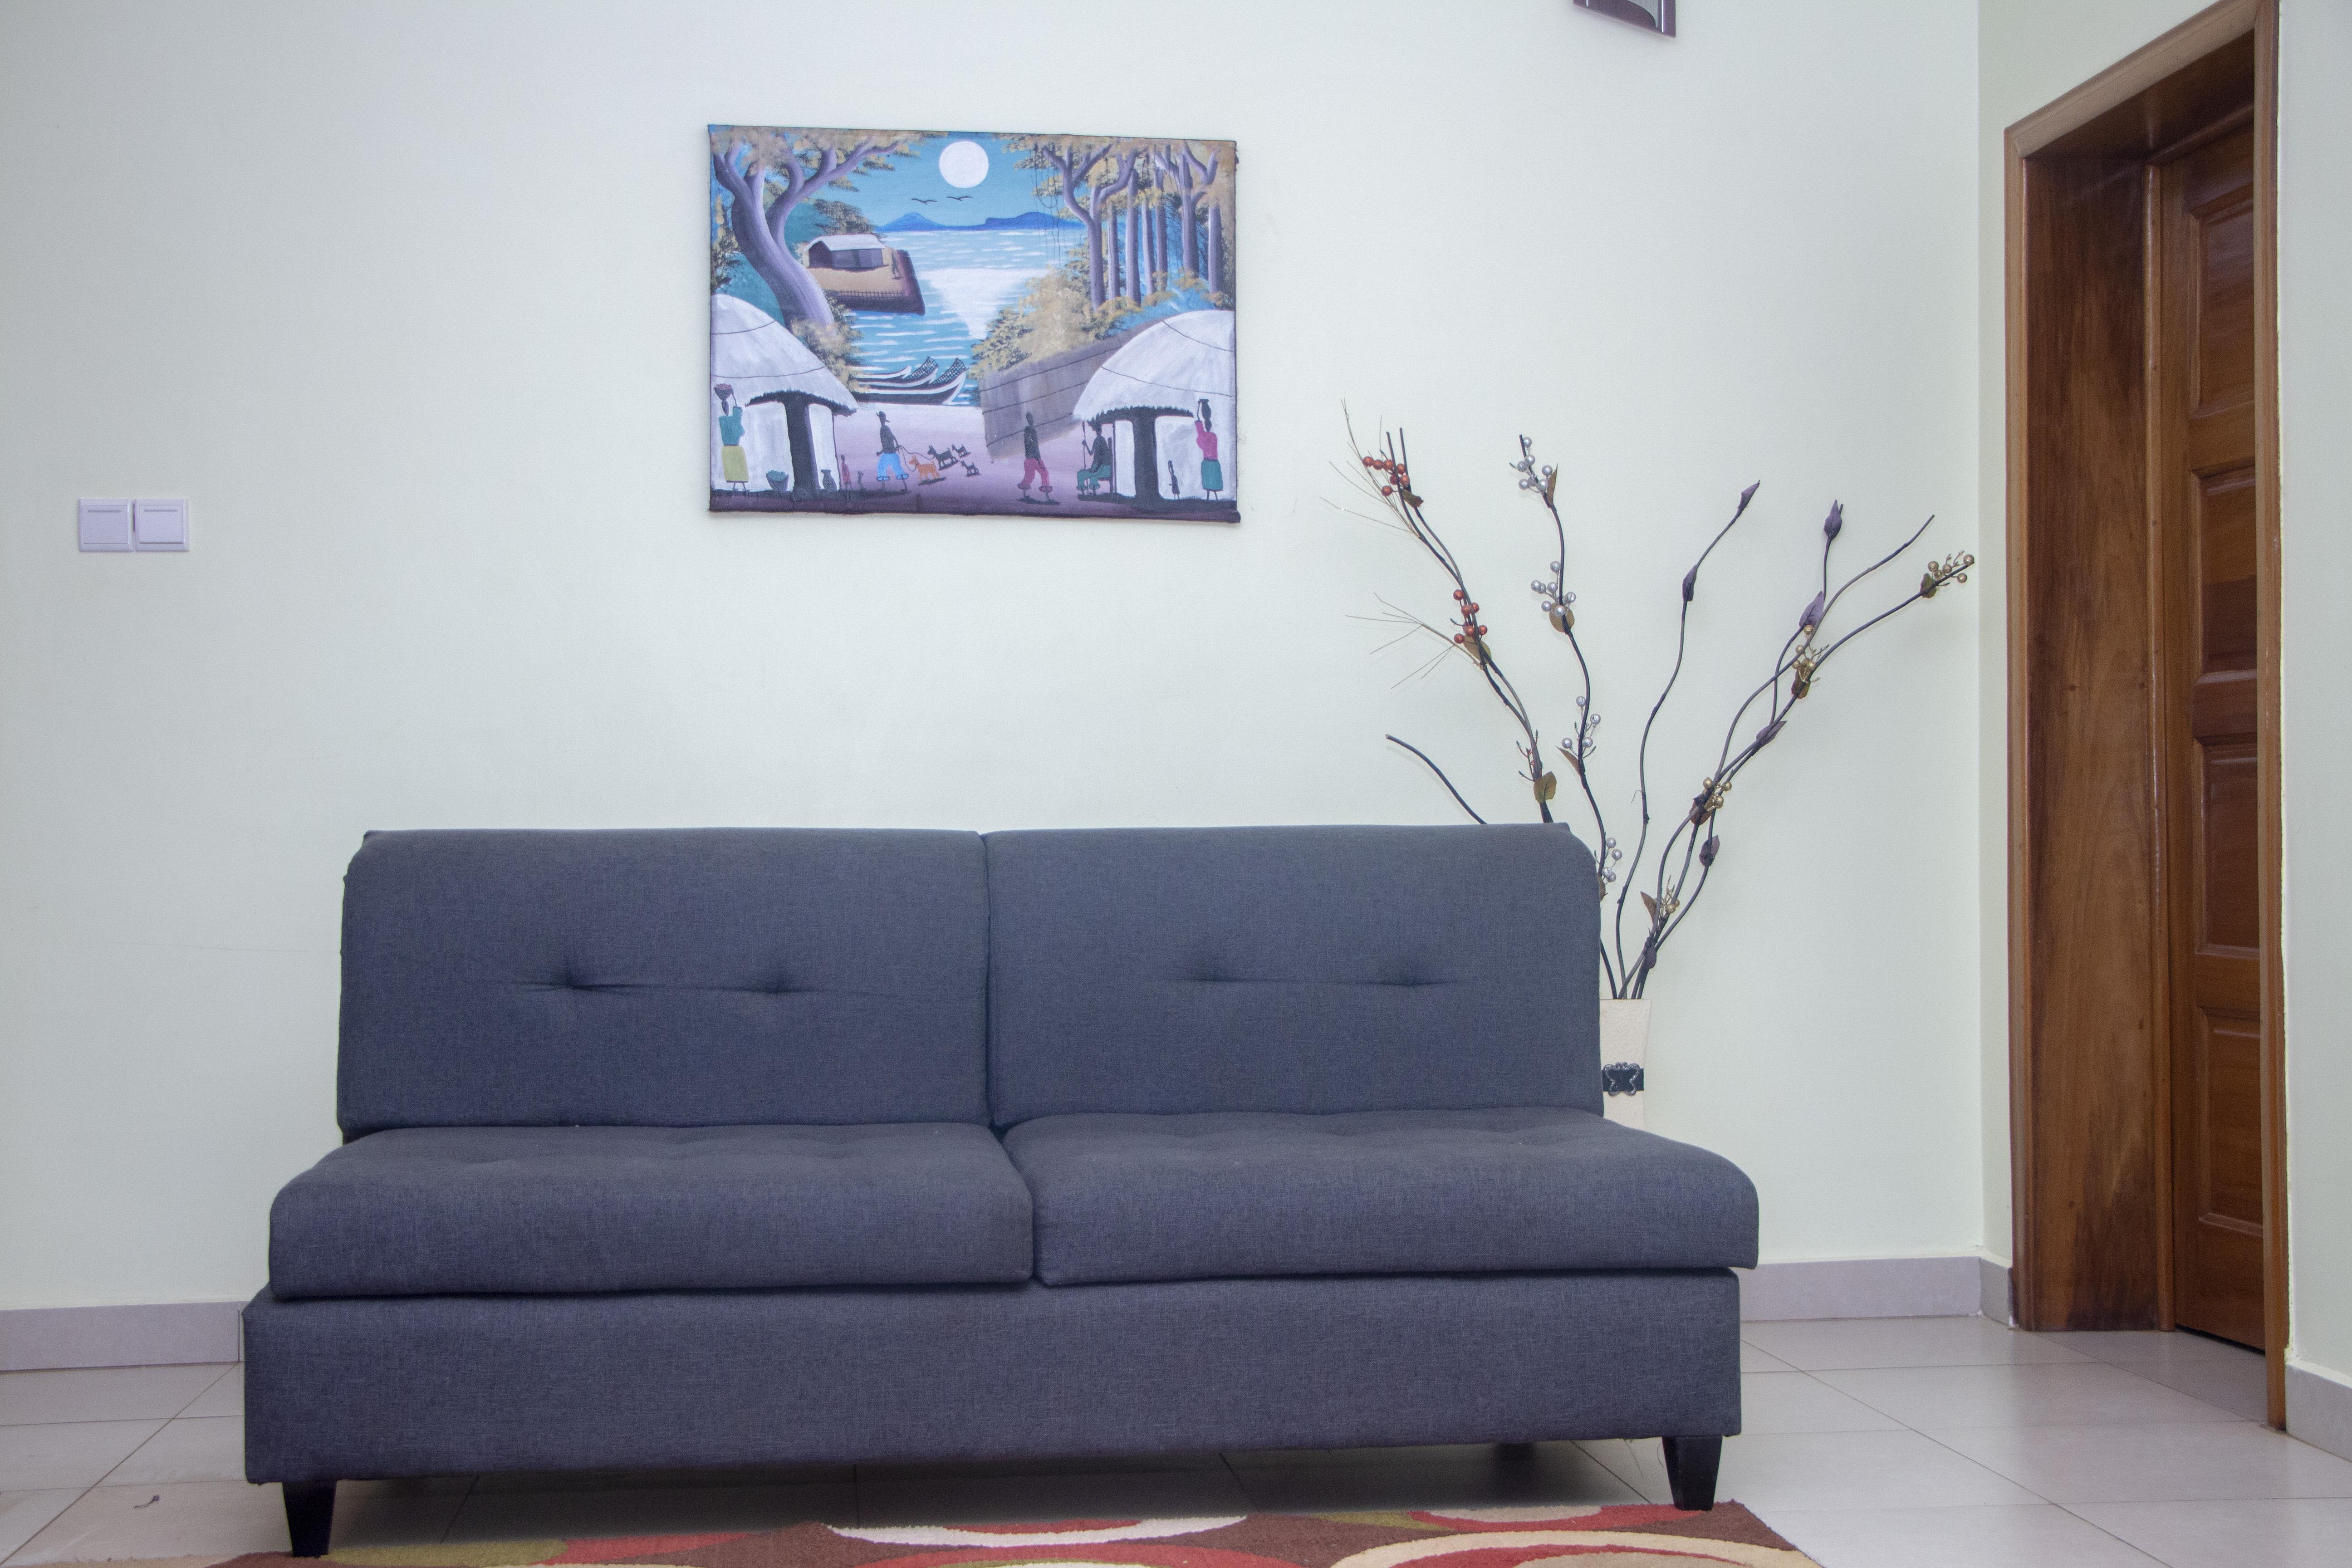 Sichere und elegante Privatzimmer in Kibagabaga, Kigali